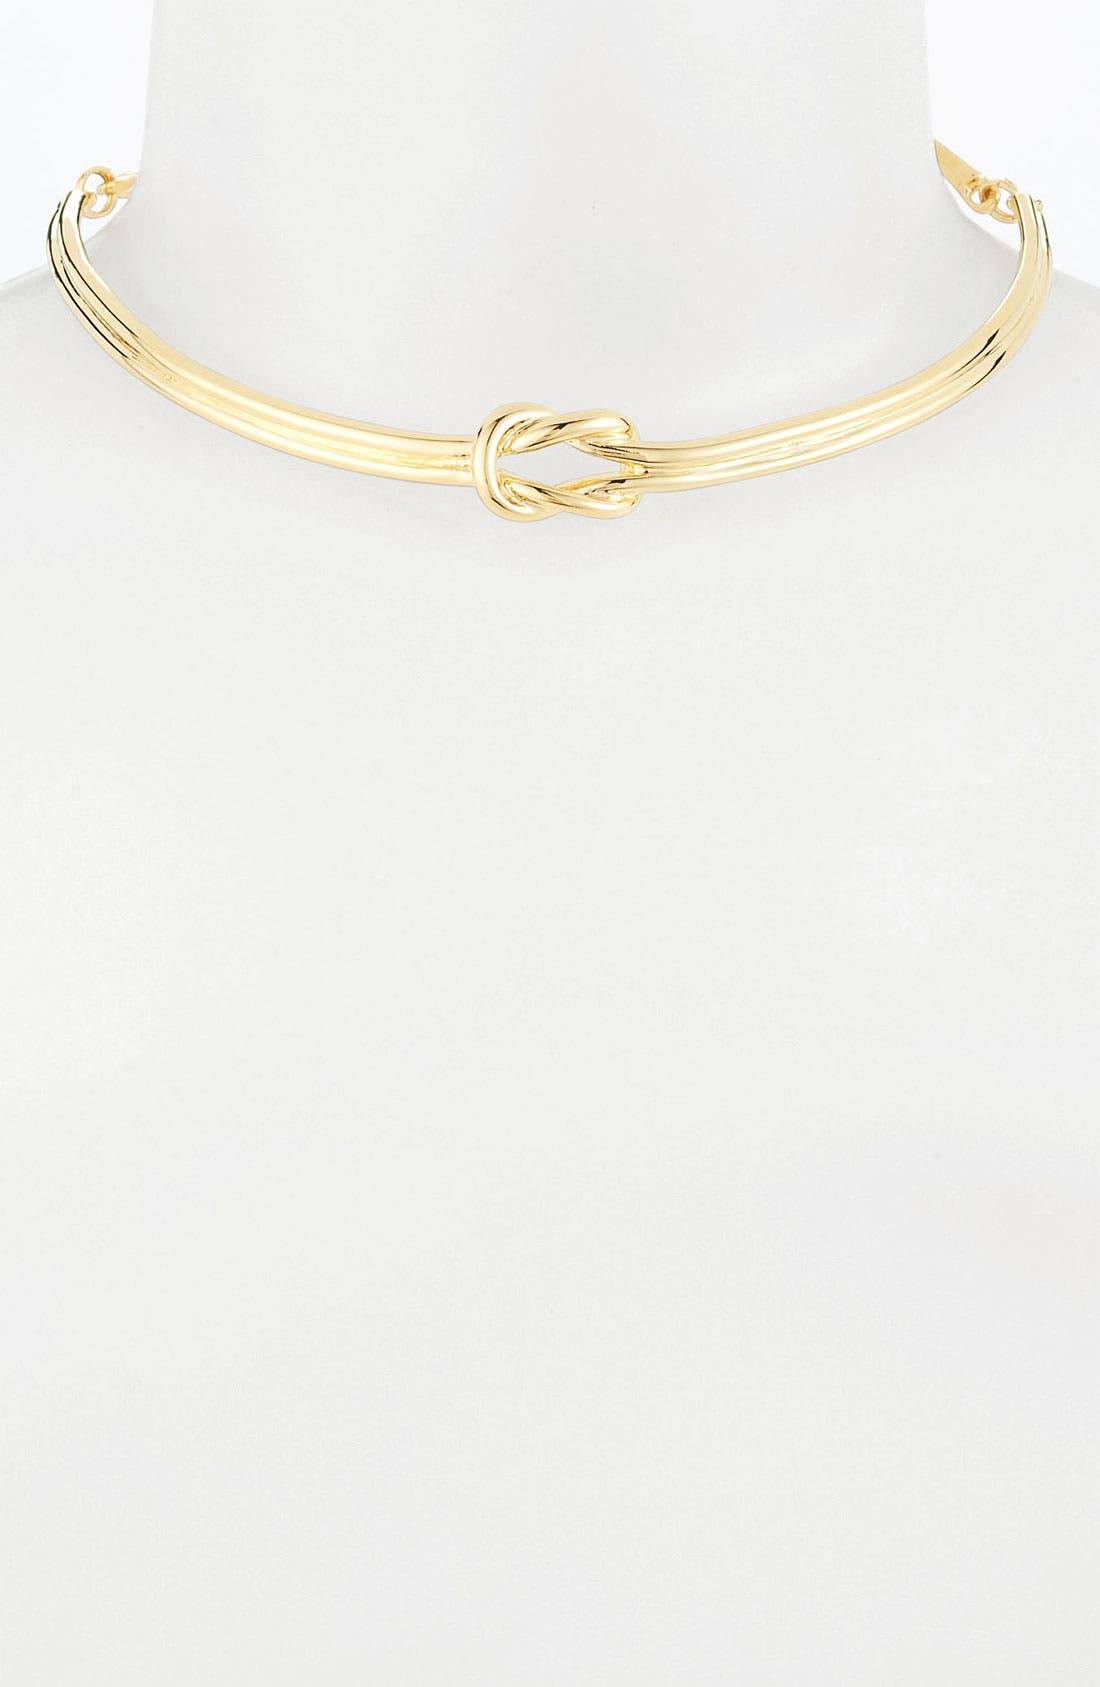 Main Image - Tory Burch 'Hercules' Collar Necklace